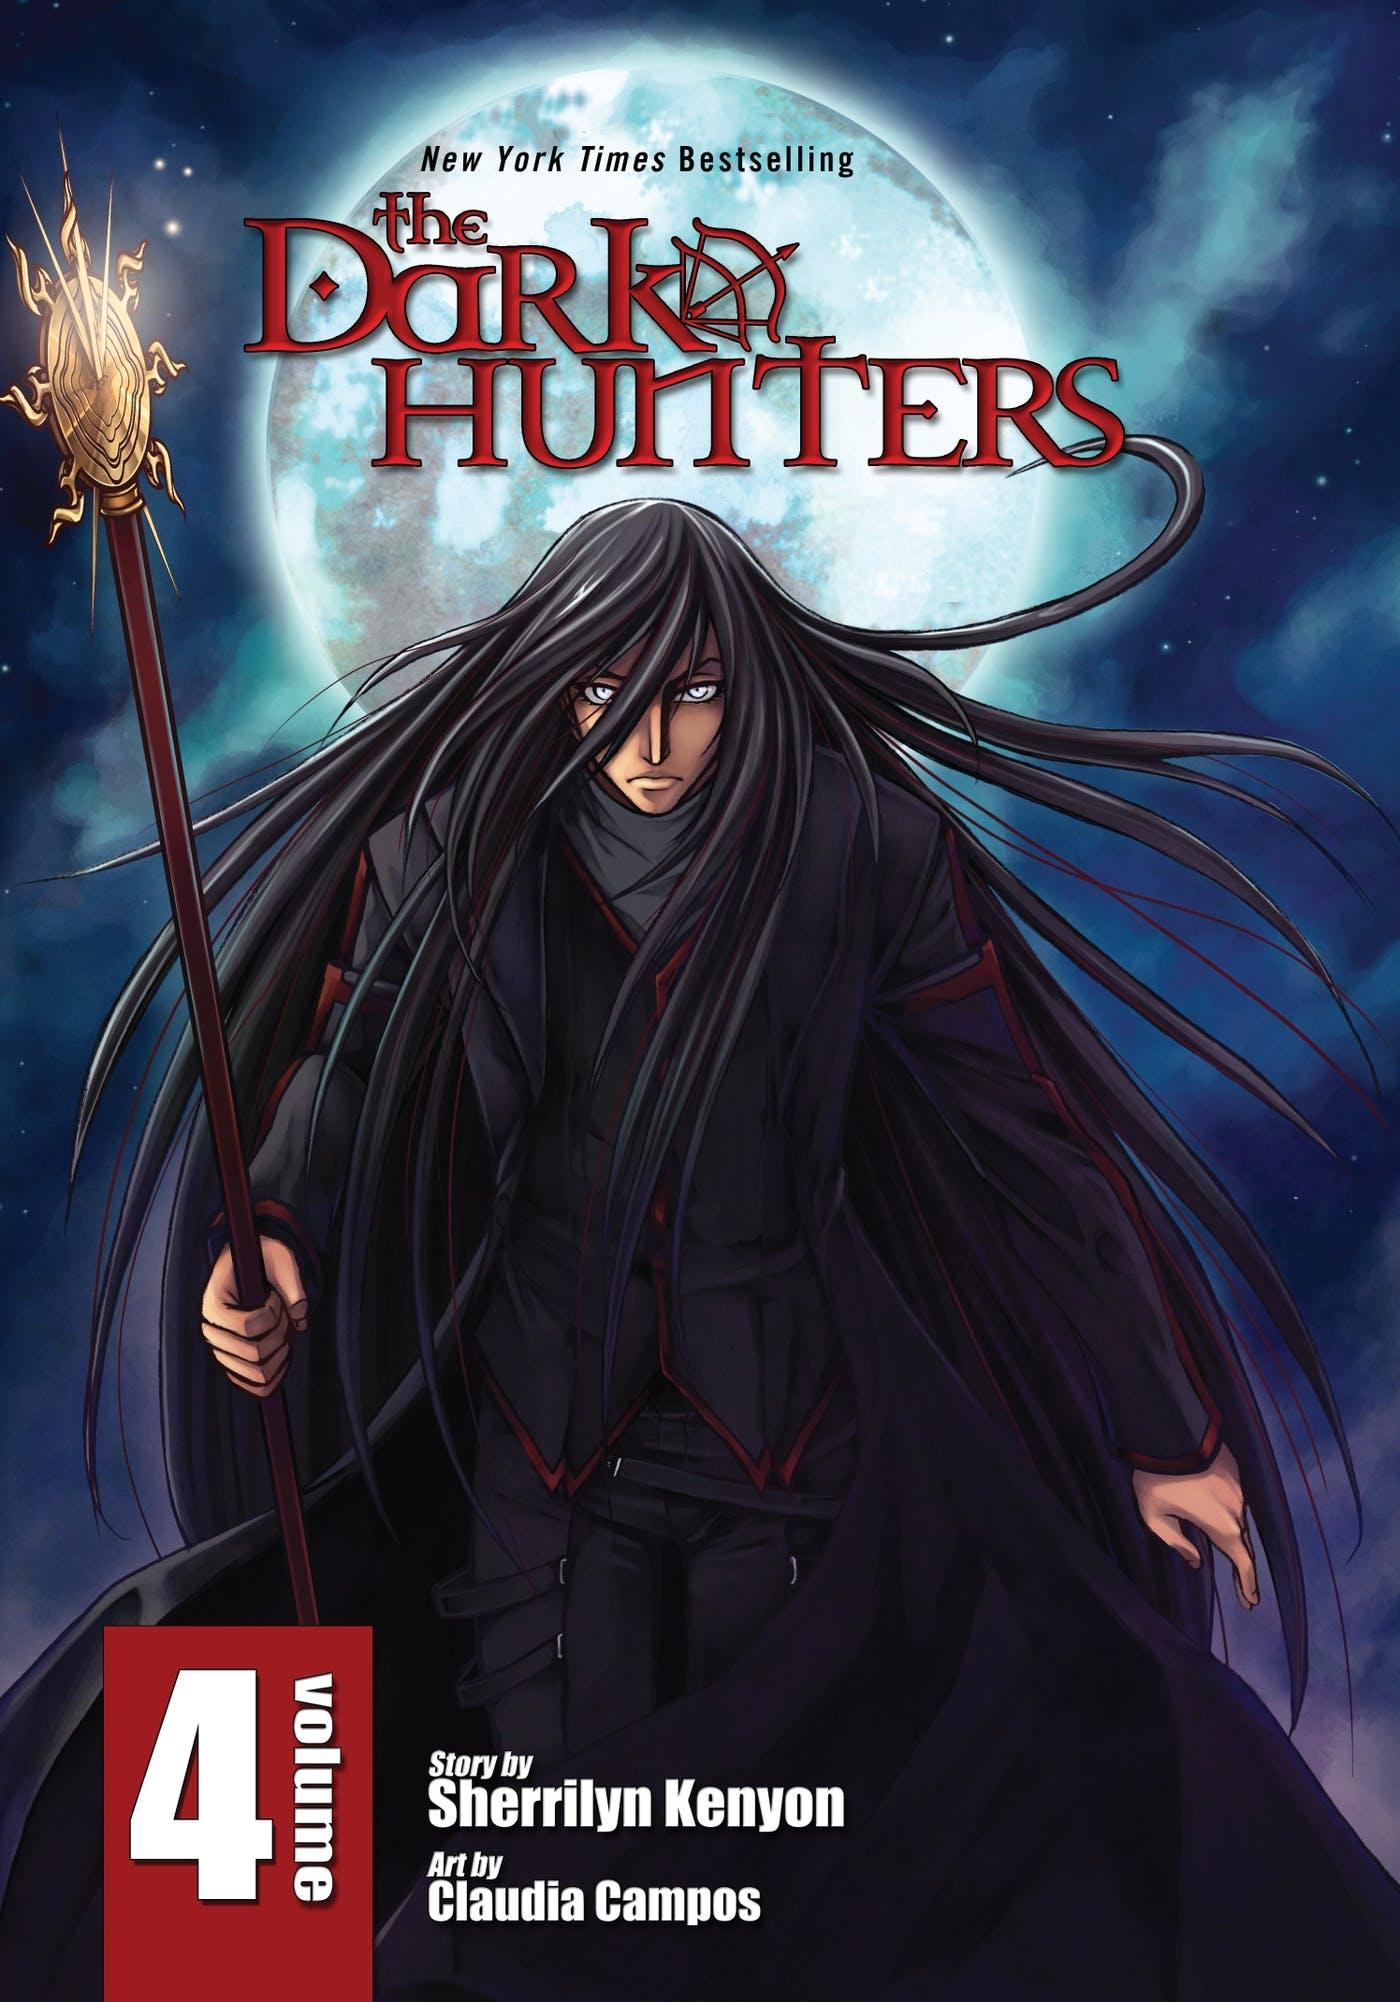 Image of The Dark-Hunters, Vol. 4